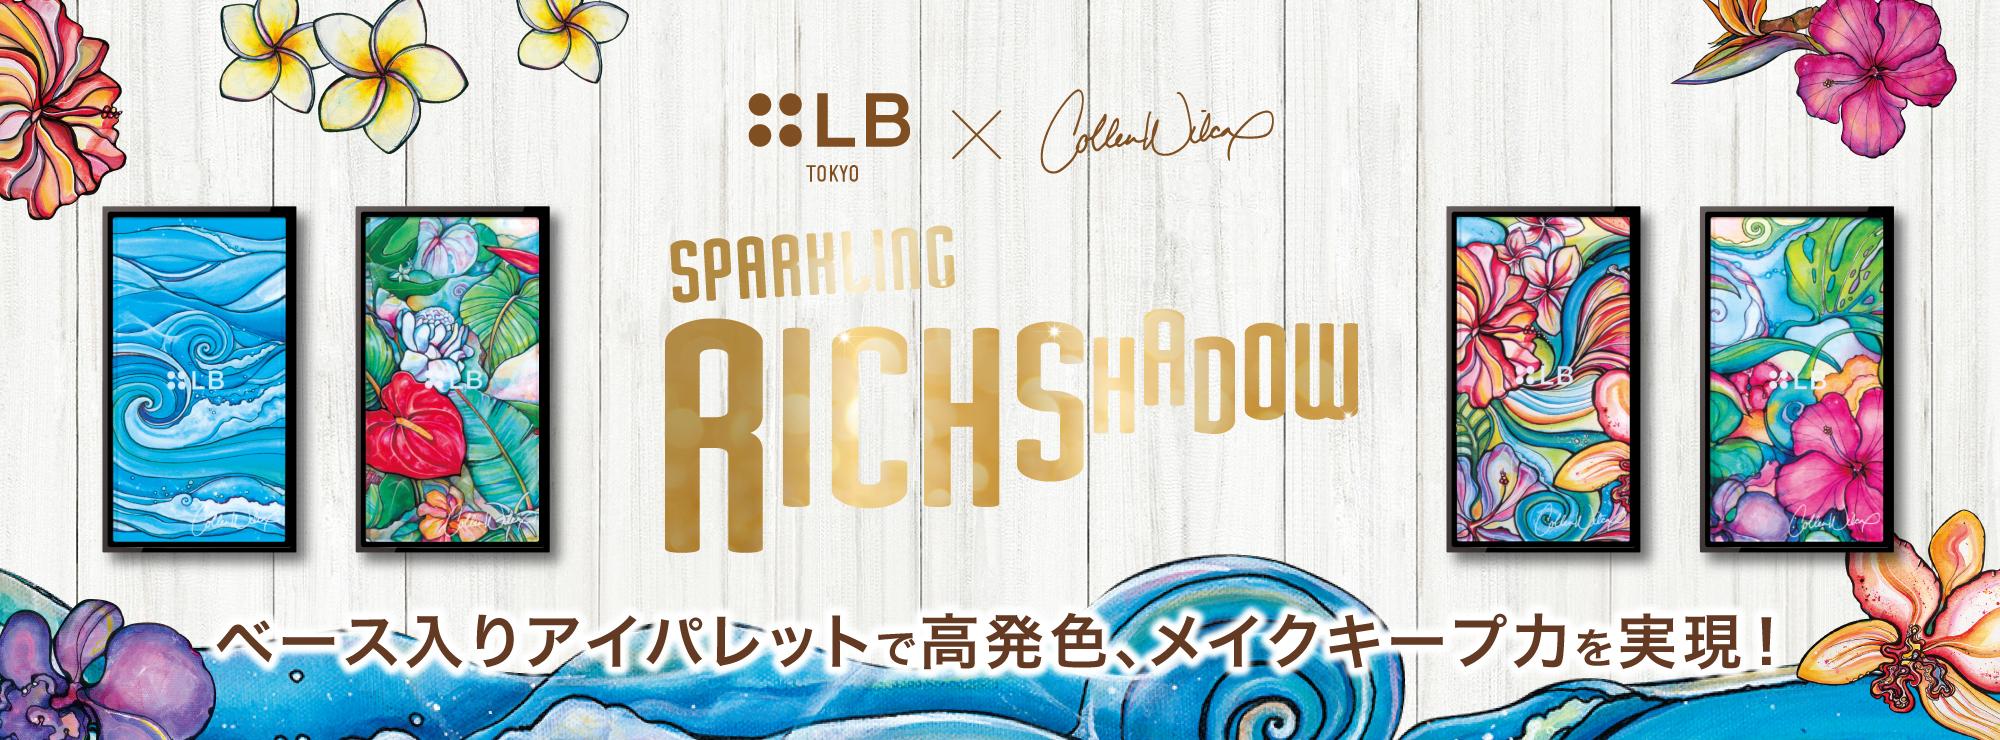 /images/slider/LB_2100x1126_SparklingRichShadow2_PC.jpg